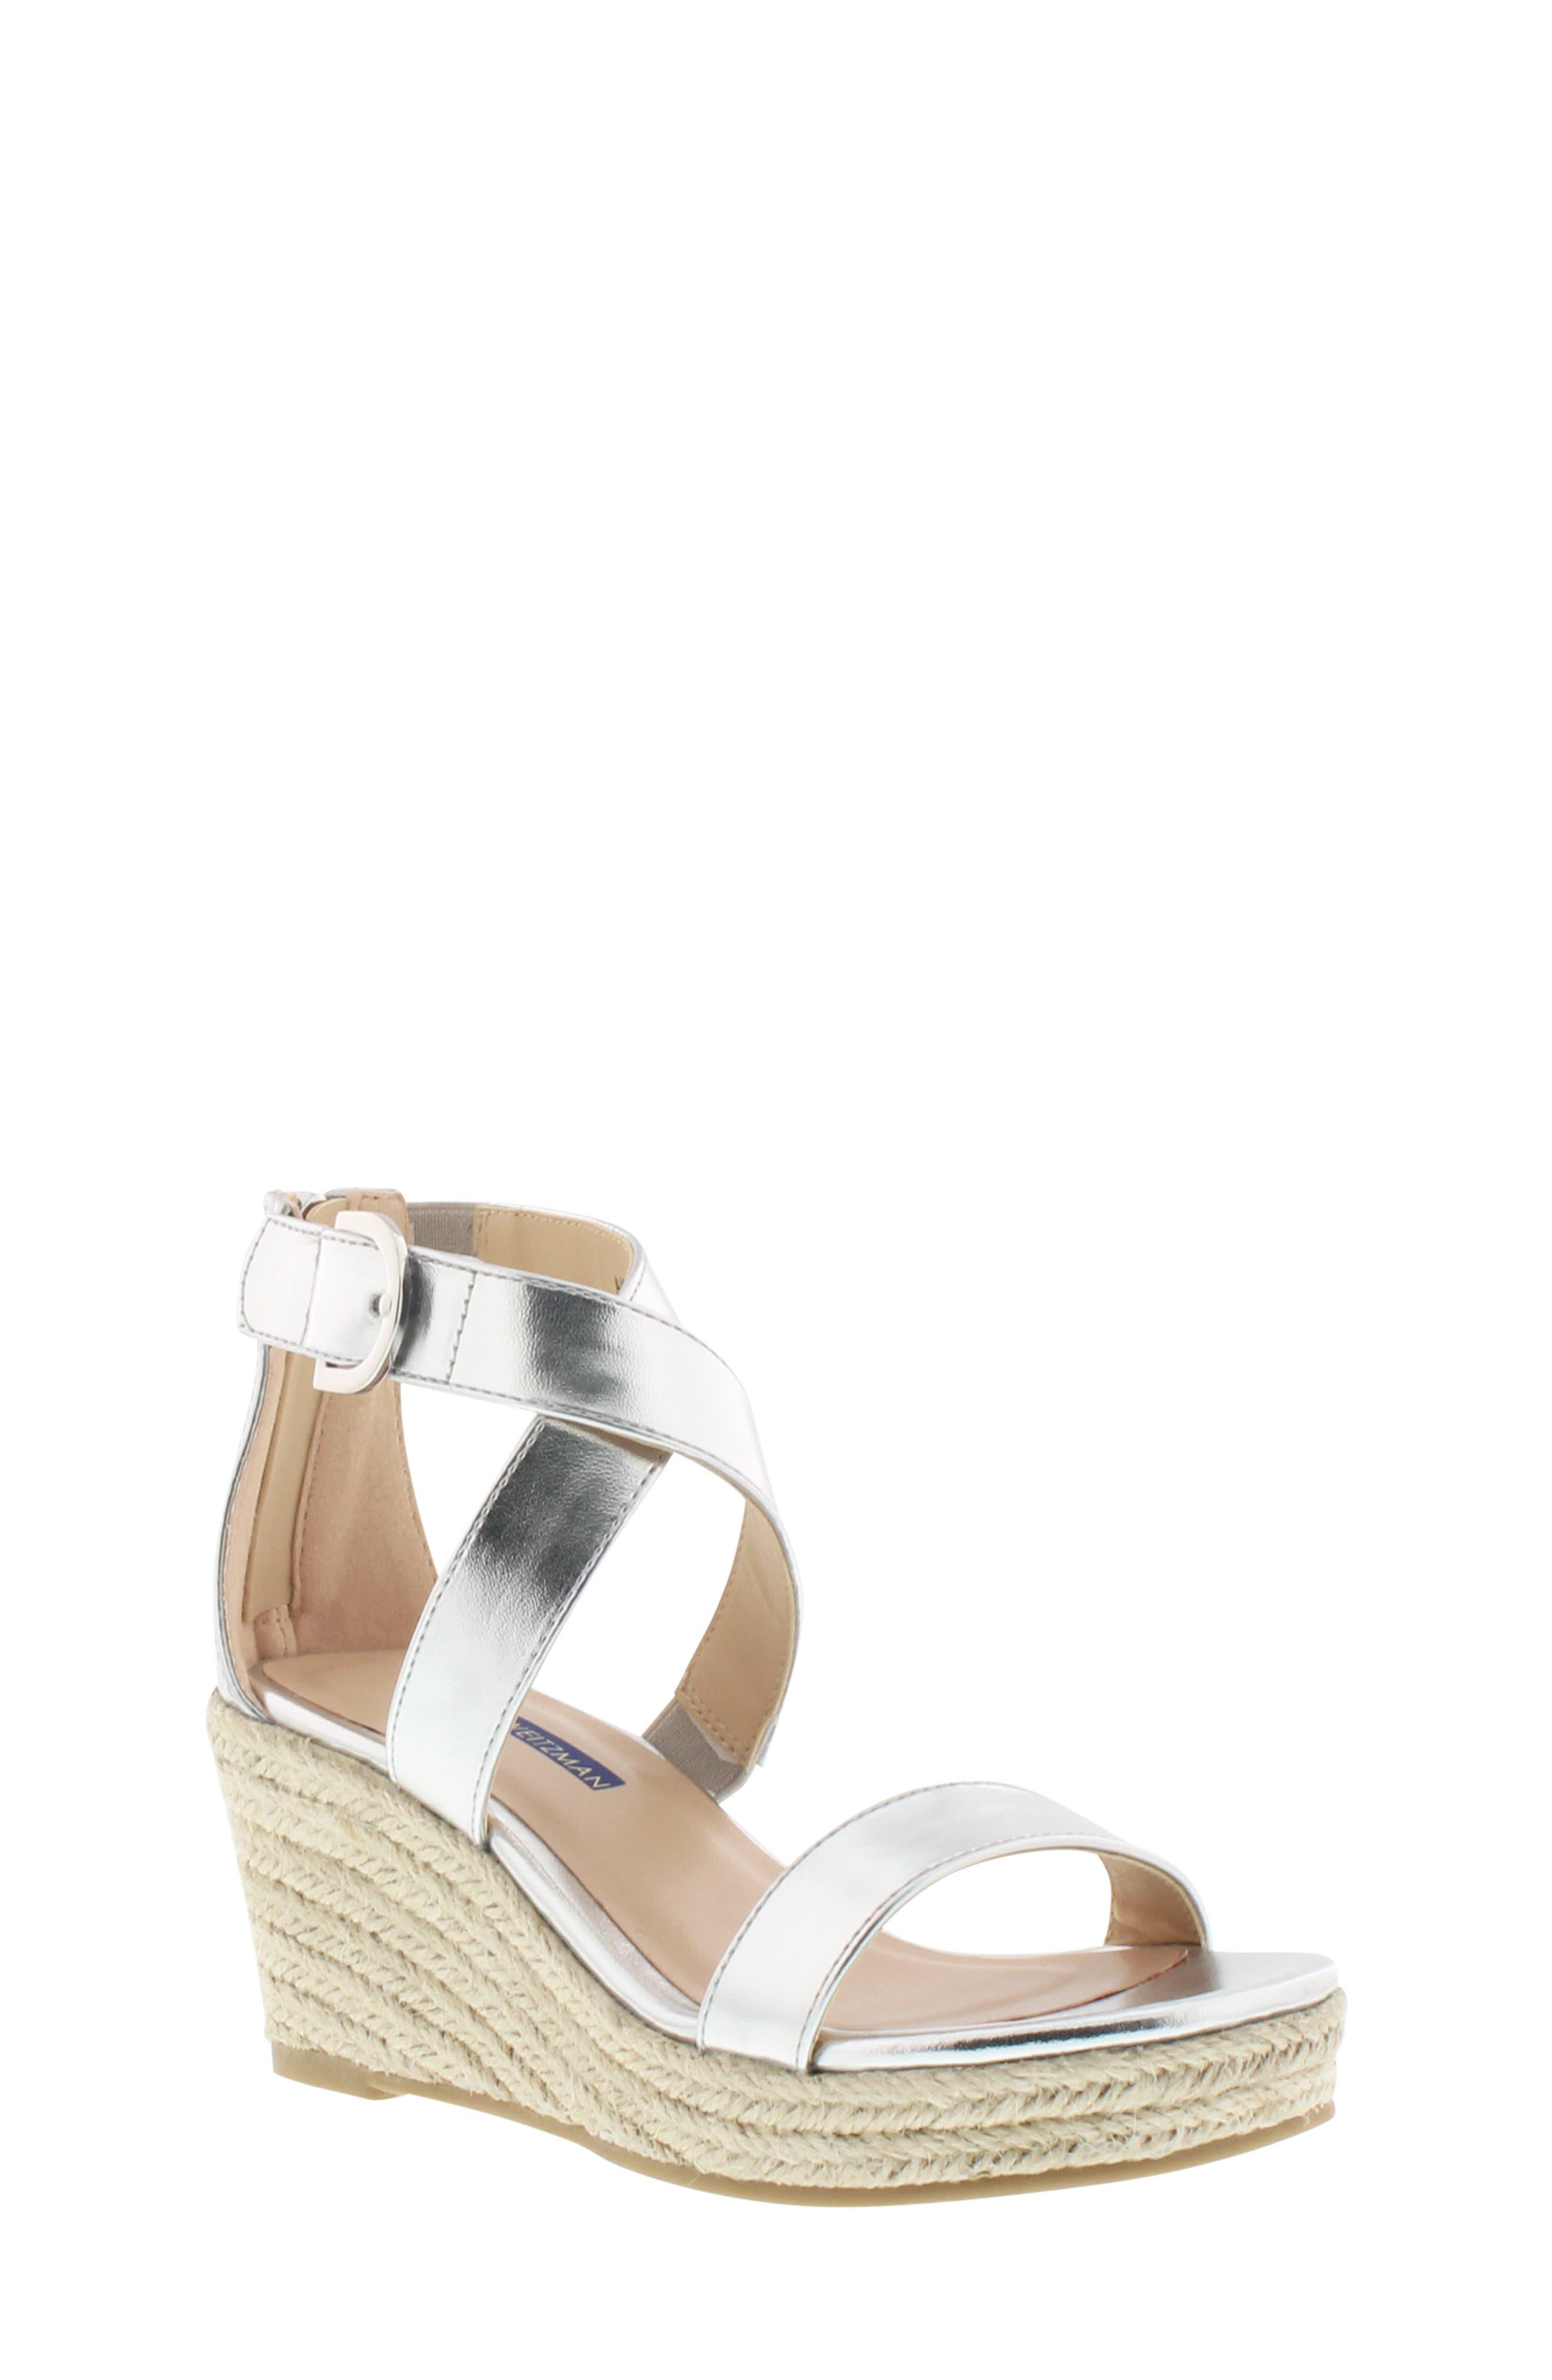 Akilah Amore Wedge Sandal, Main, color, SILVER